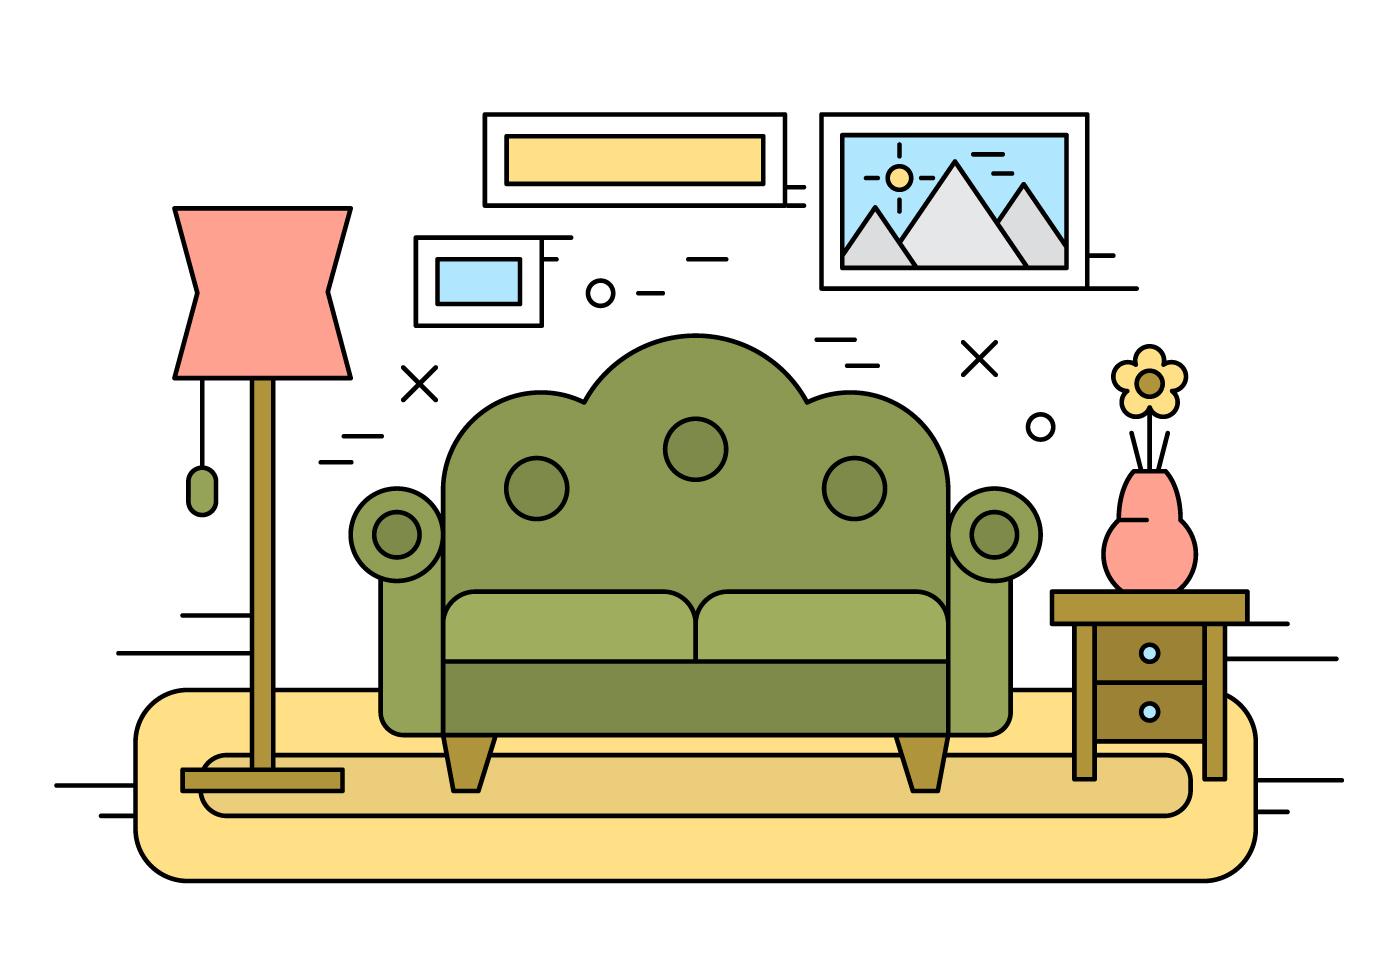 Living Room Illustration Download Free Vector Art Stock